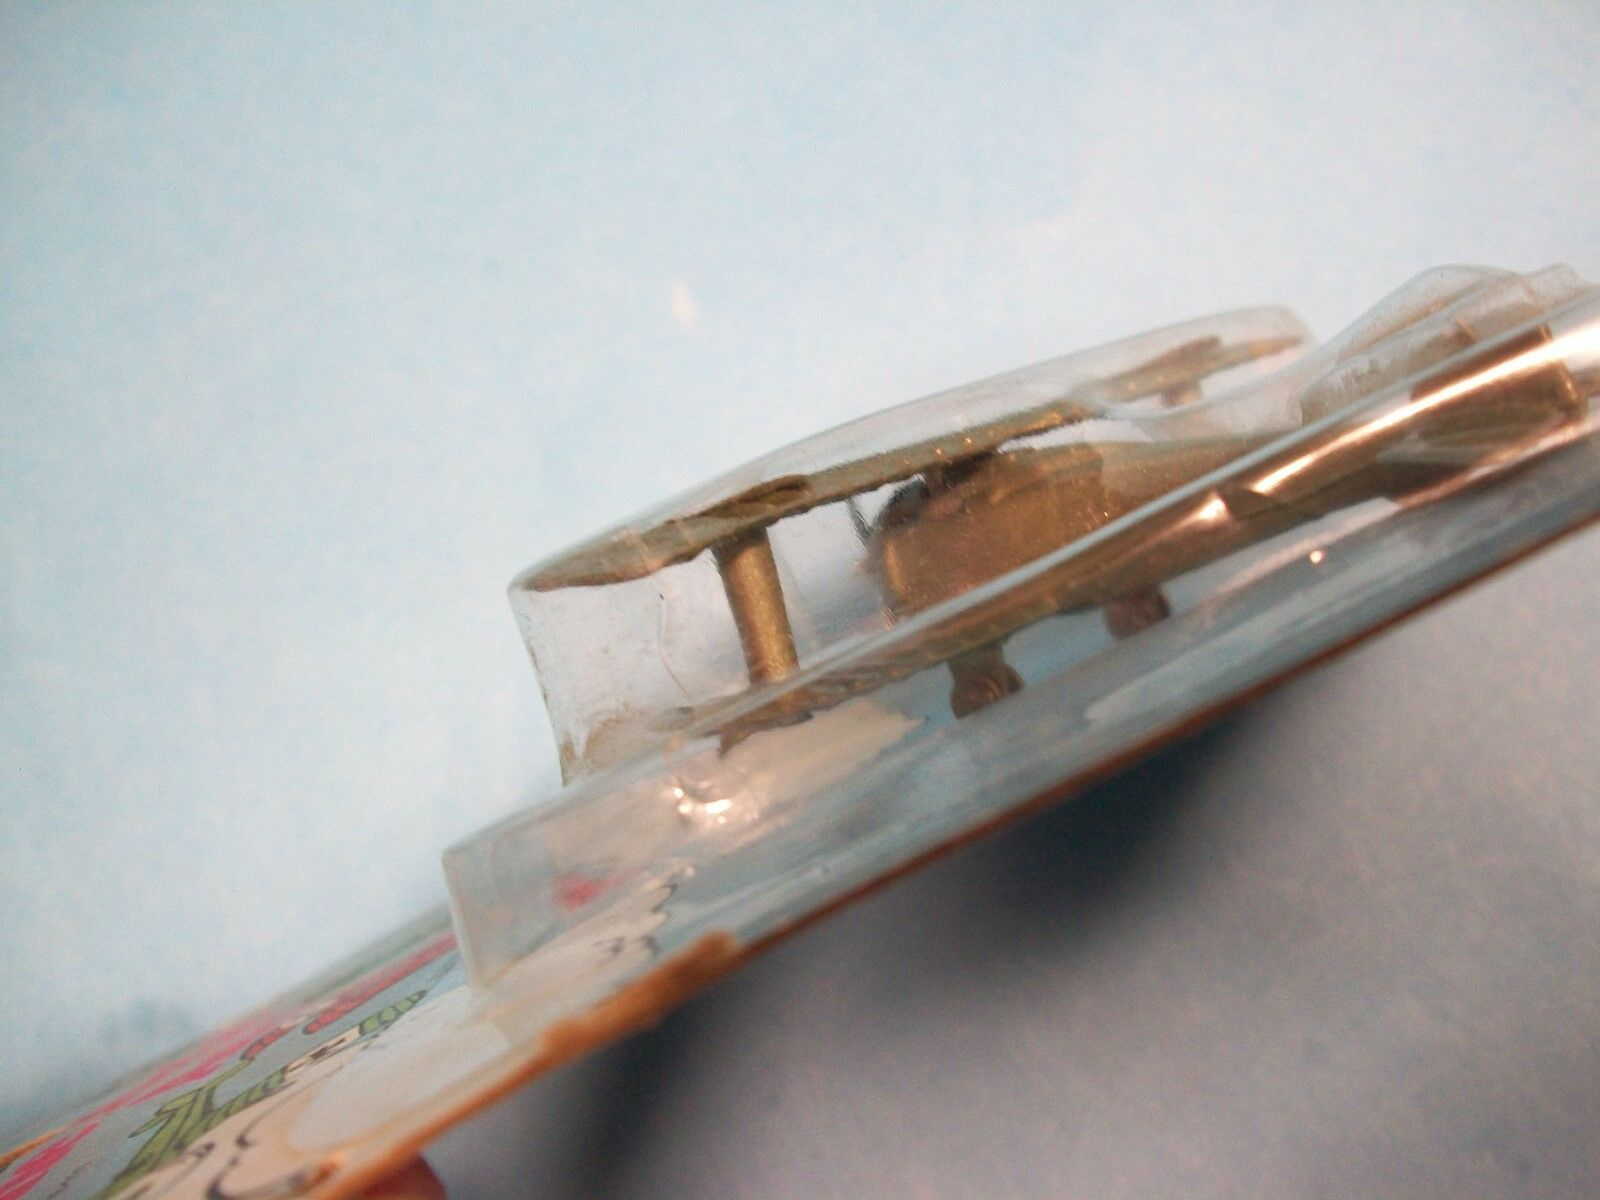 Larami Die Cast Metal THE AERIAL ACES ACES ACES Green Nievport Vintage Airplane Plane 894d90